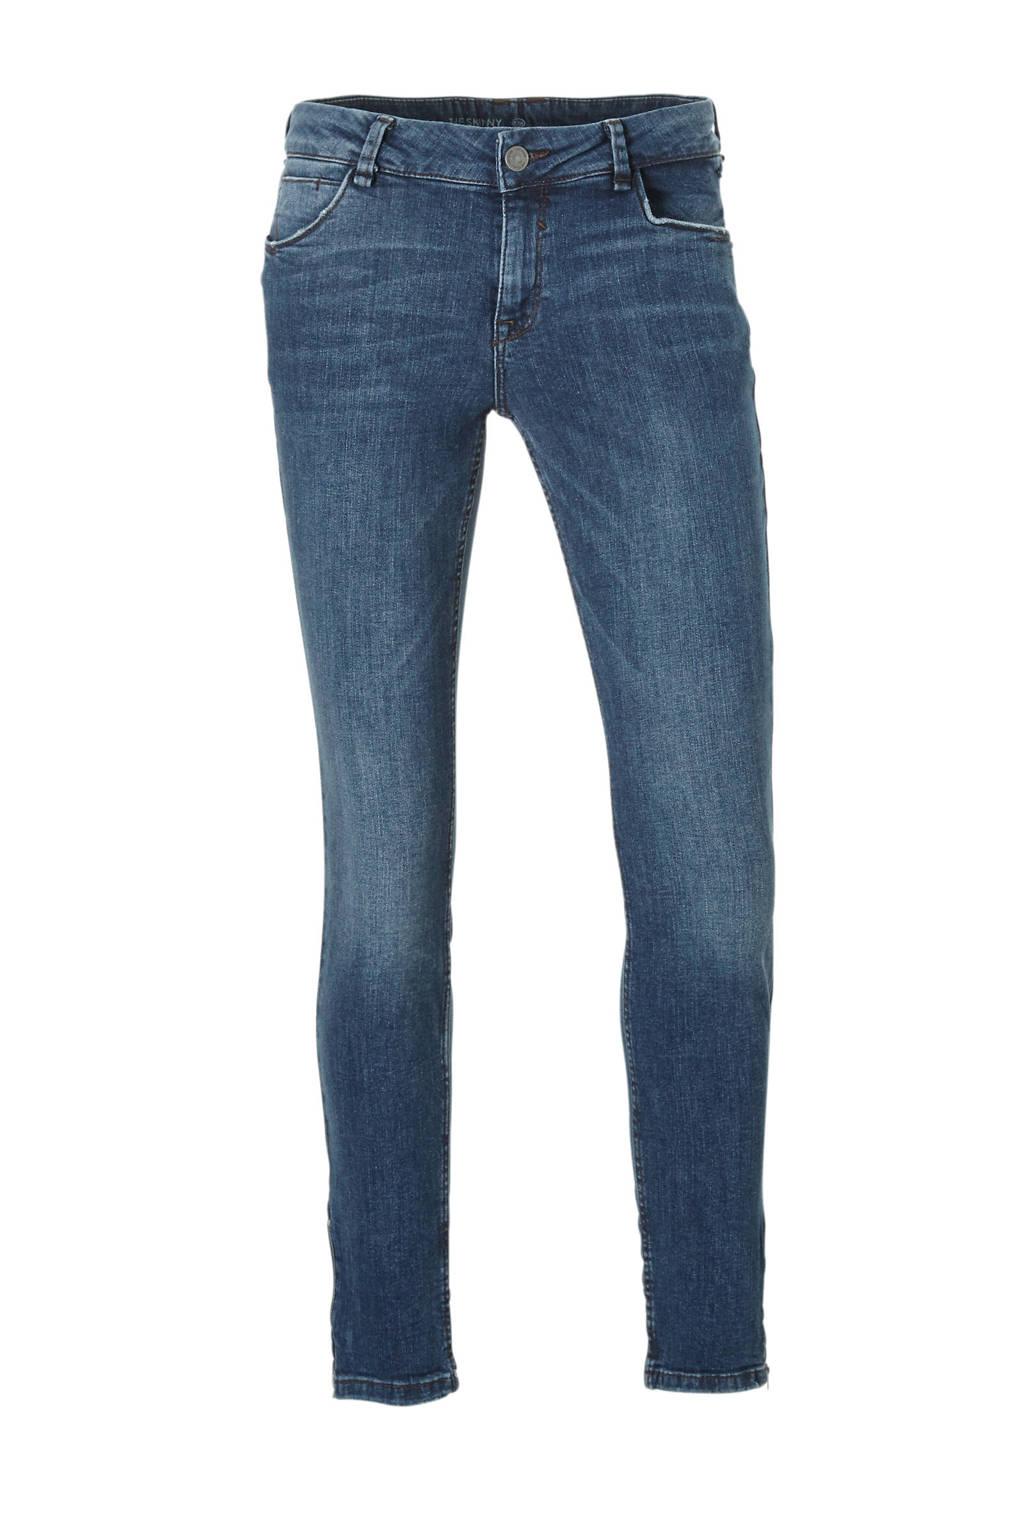 C&A The Denim regular fit jeans, Dark denim